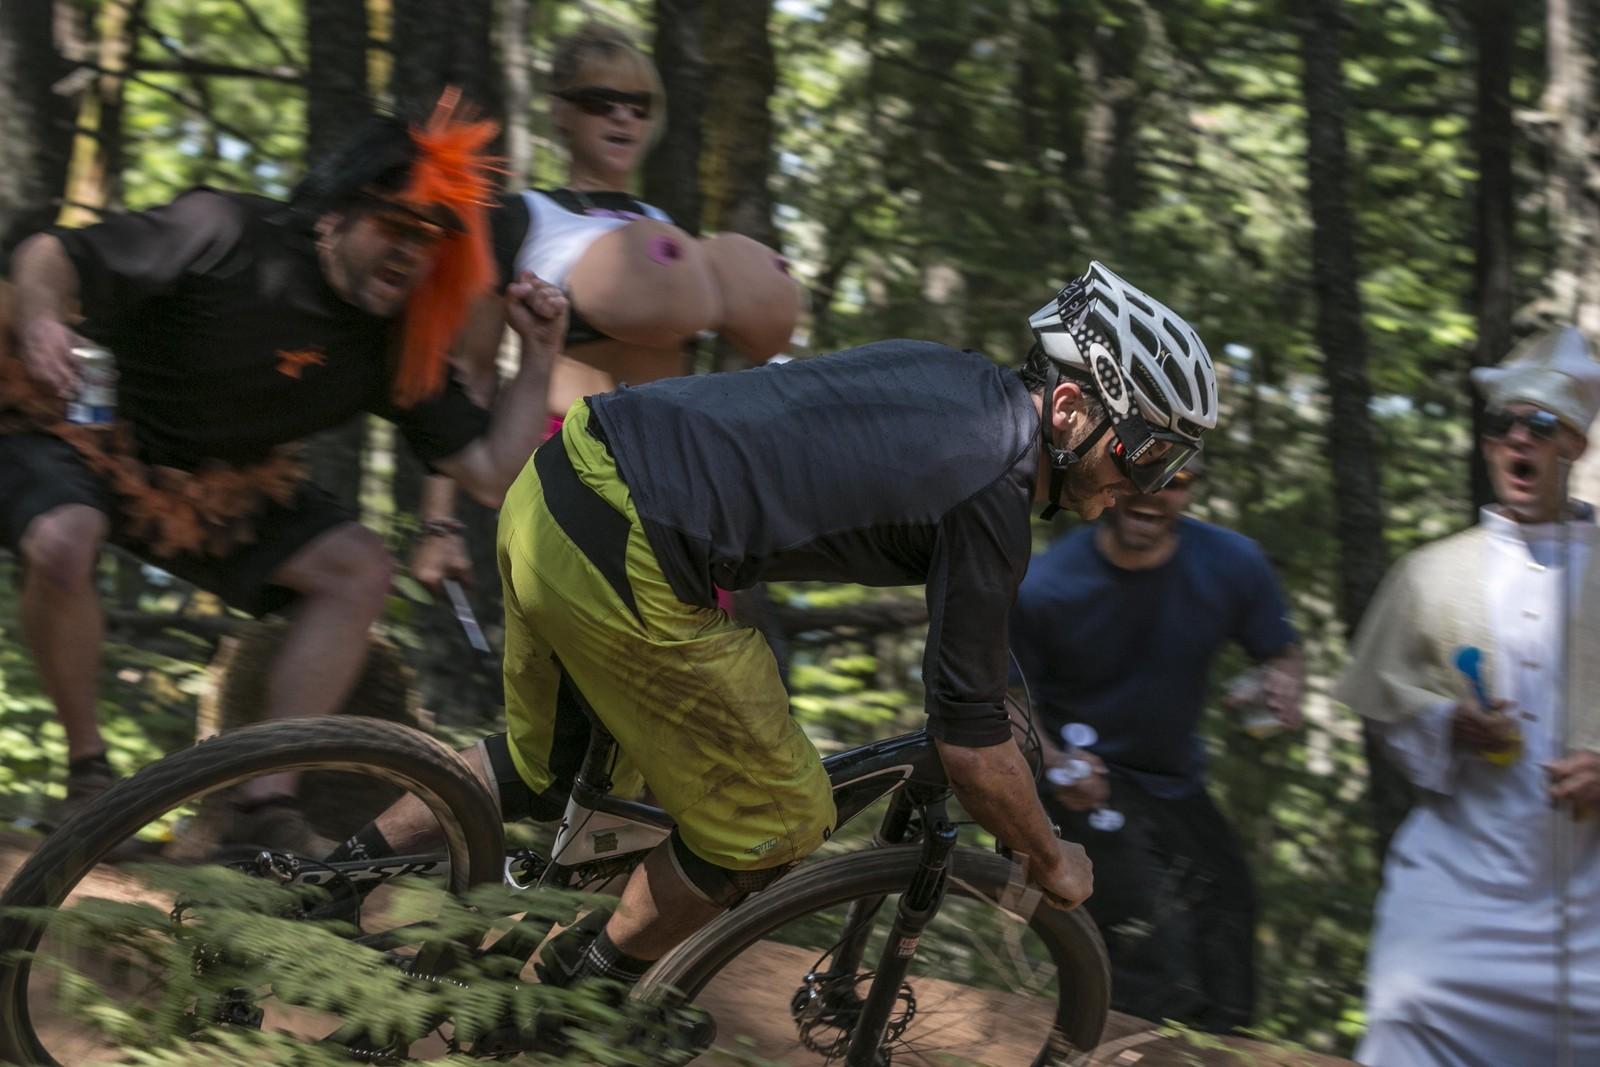 Ryan Cleek - Oregon Enduro Series, Hood River - Oregon Enduro Hood River - Mountain Biking Pictures - Vital MTB